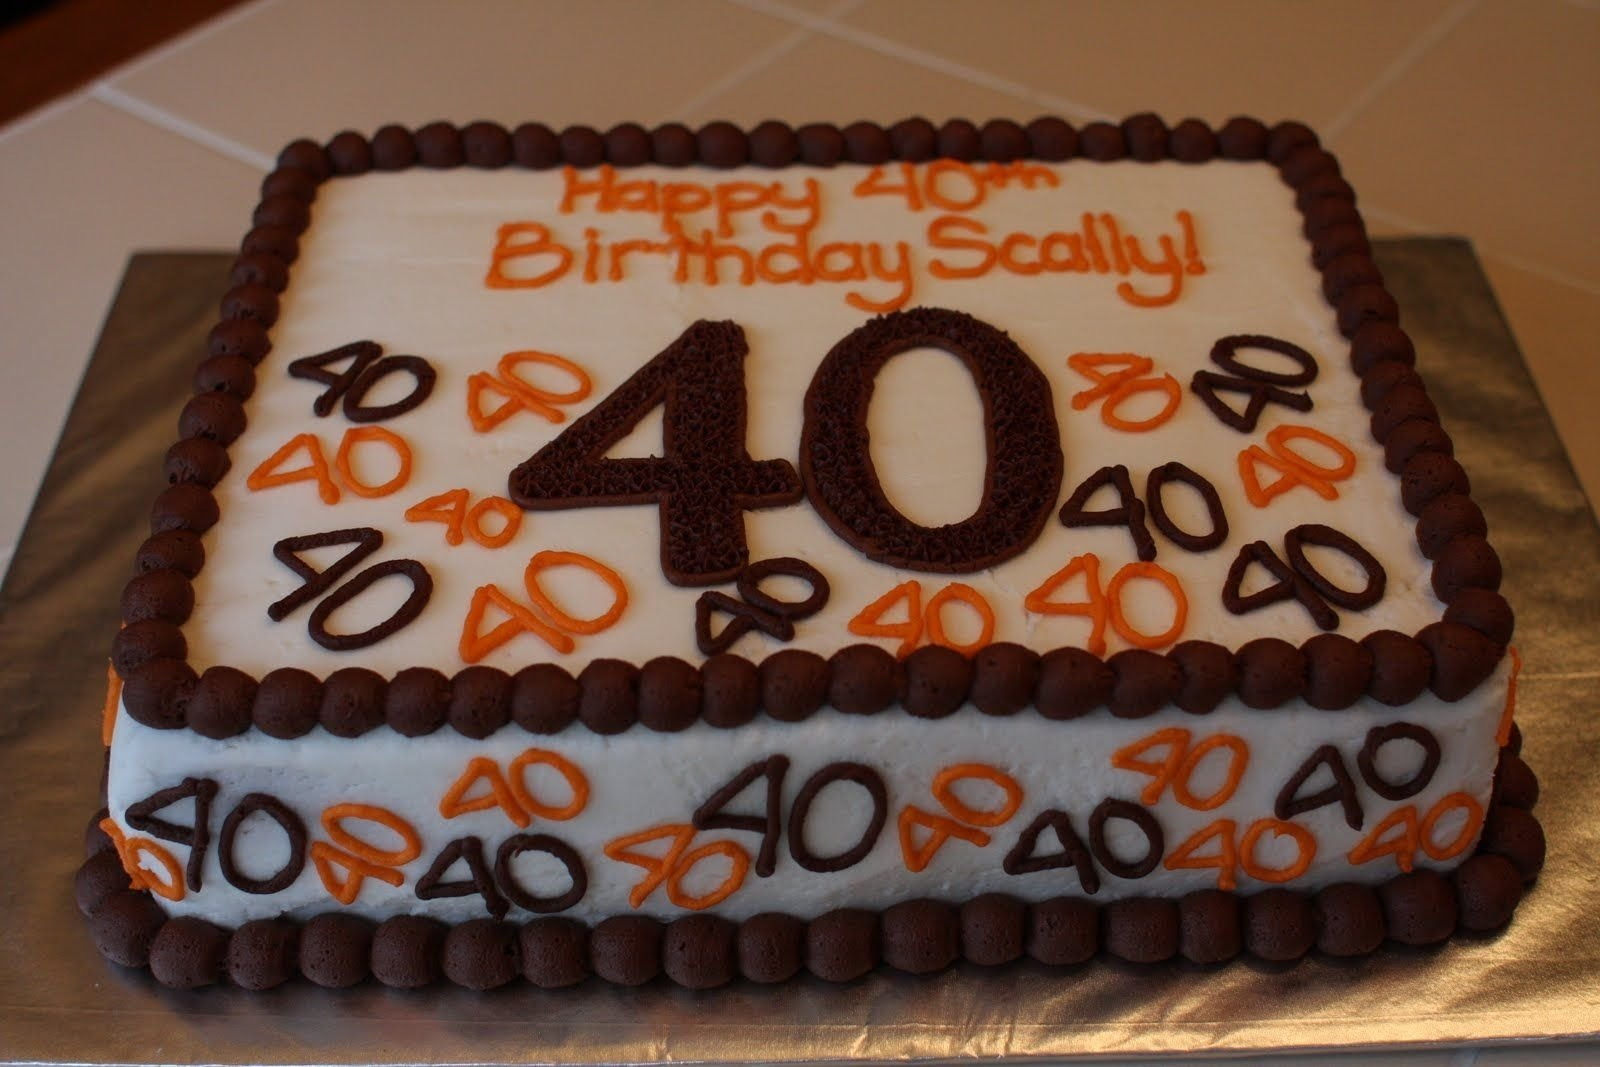 10 Stylish Easy Birthday Cake Ideas For Men 40th birthday cake ideas for men google search let them eat 2 2020